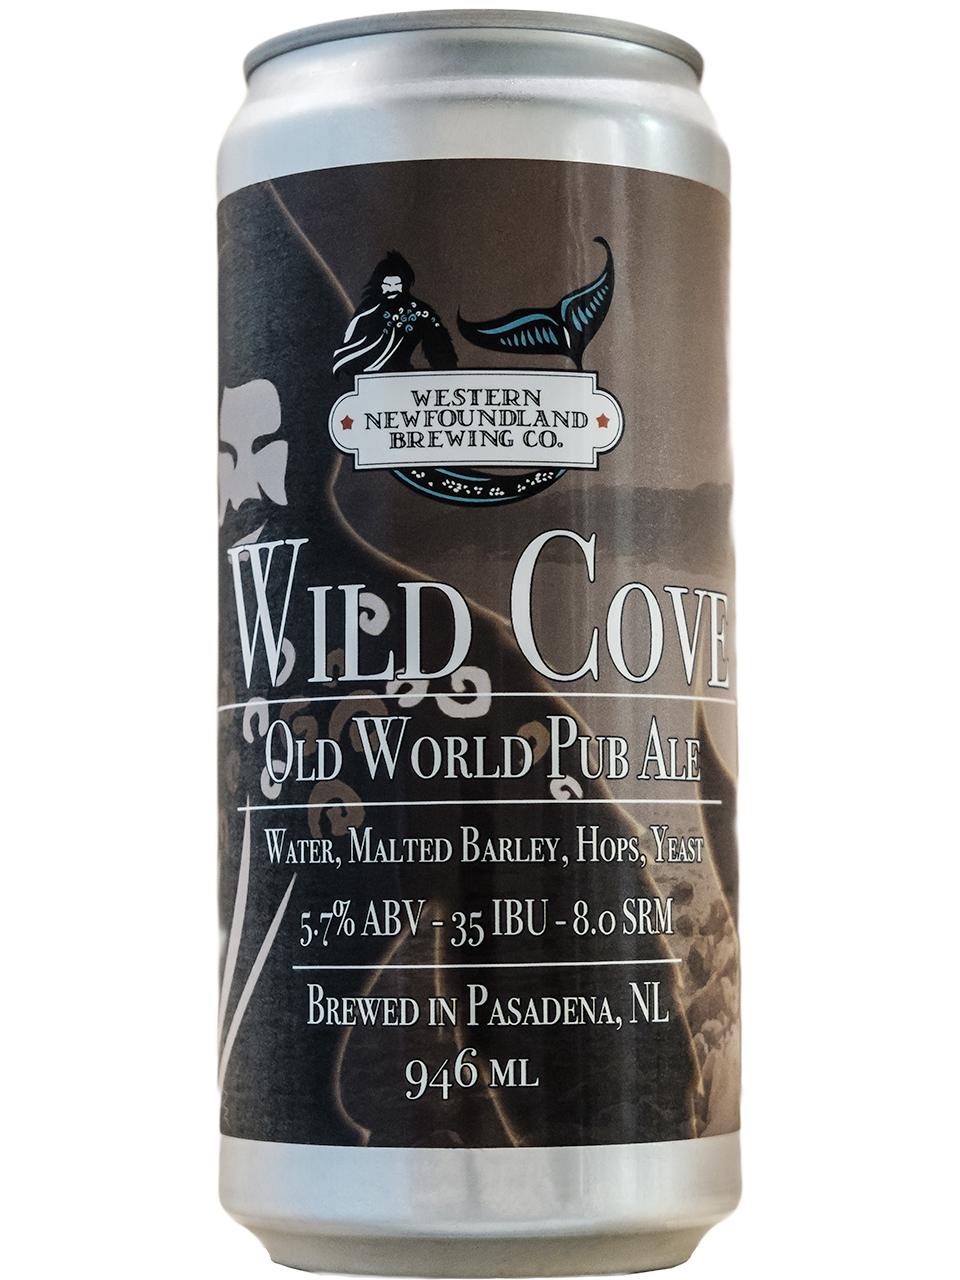 Western NL Brewing Wild Cove Pub Ale